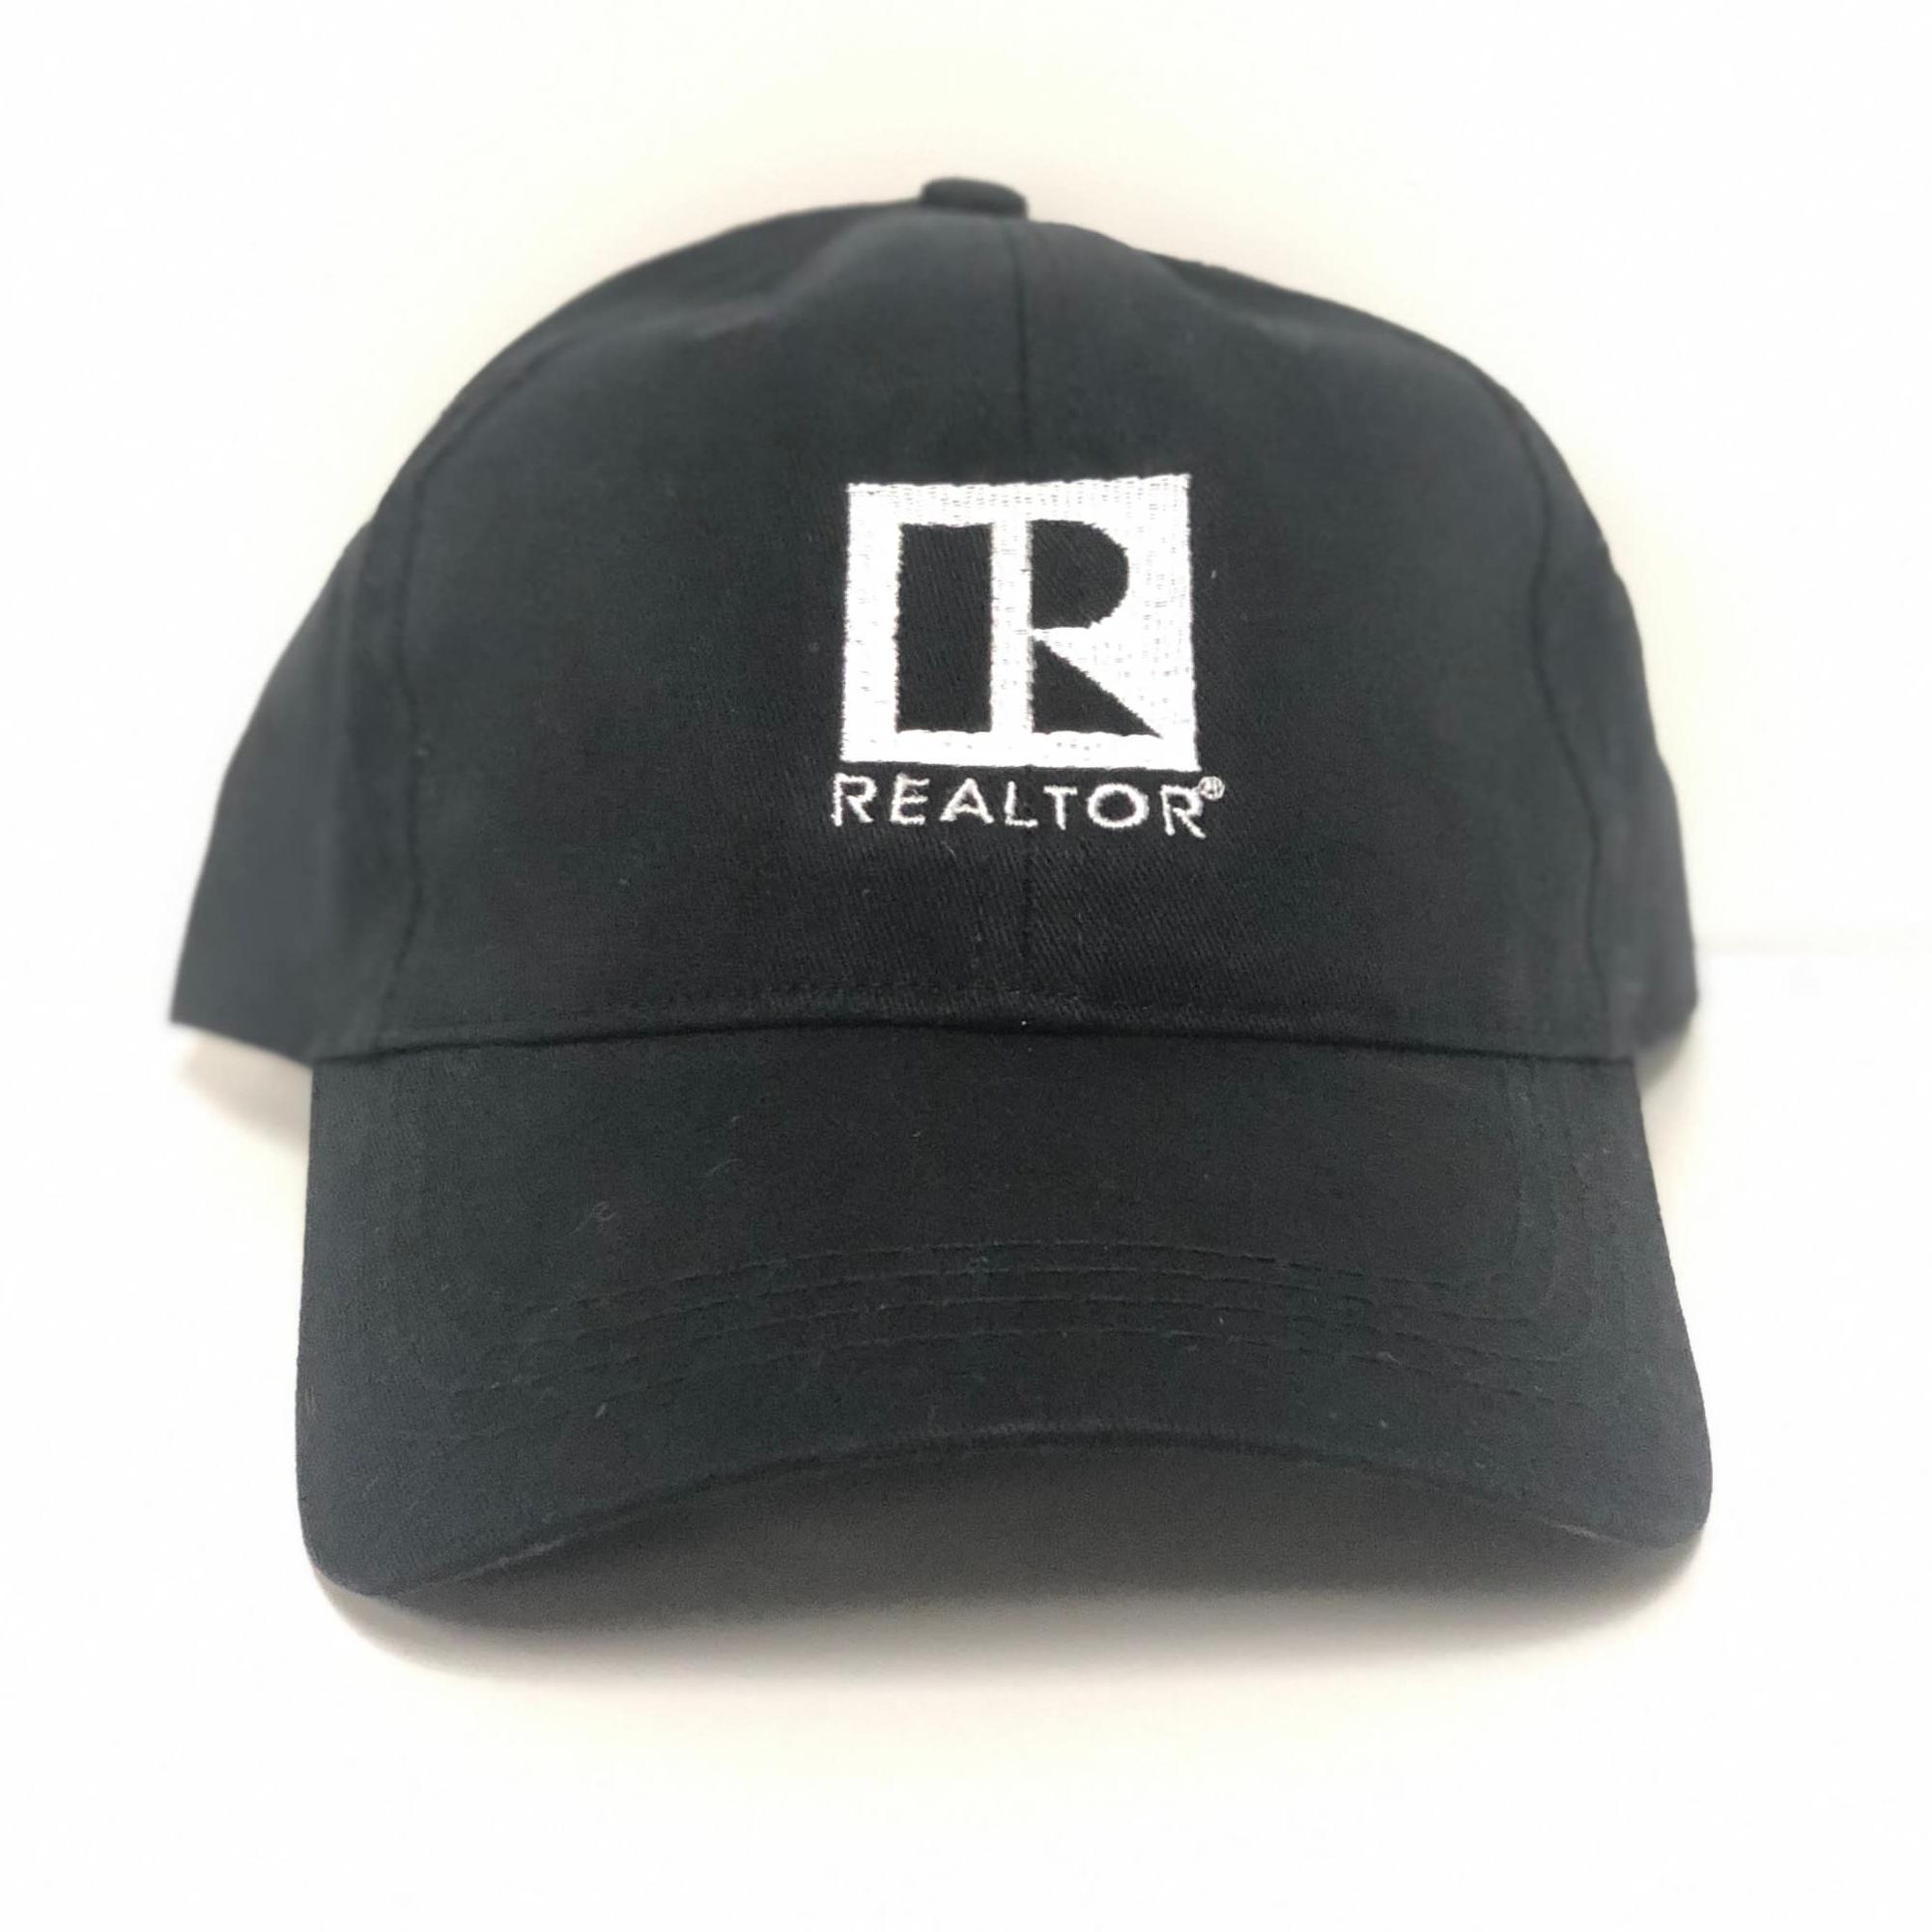 Realtor cap, realtor hat, black hat, black cap,